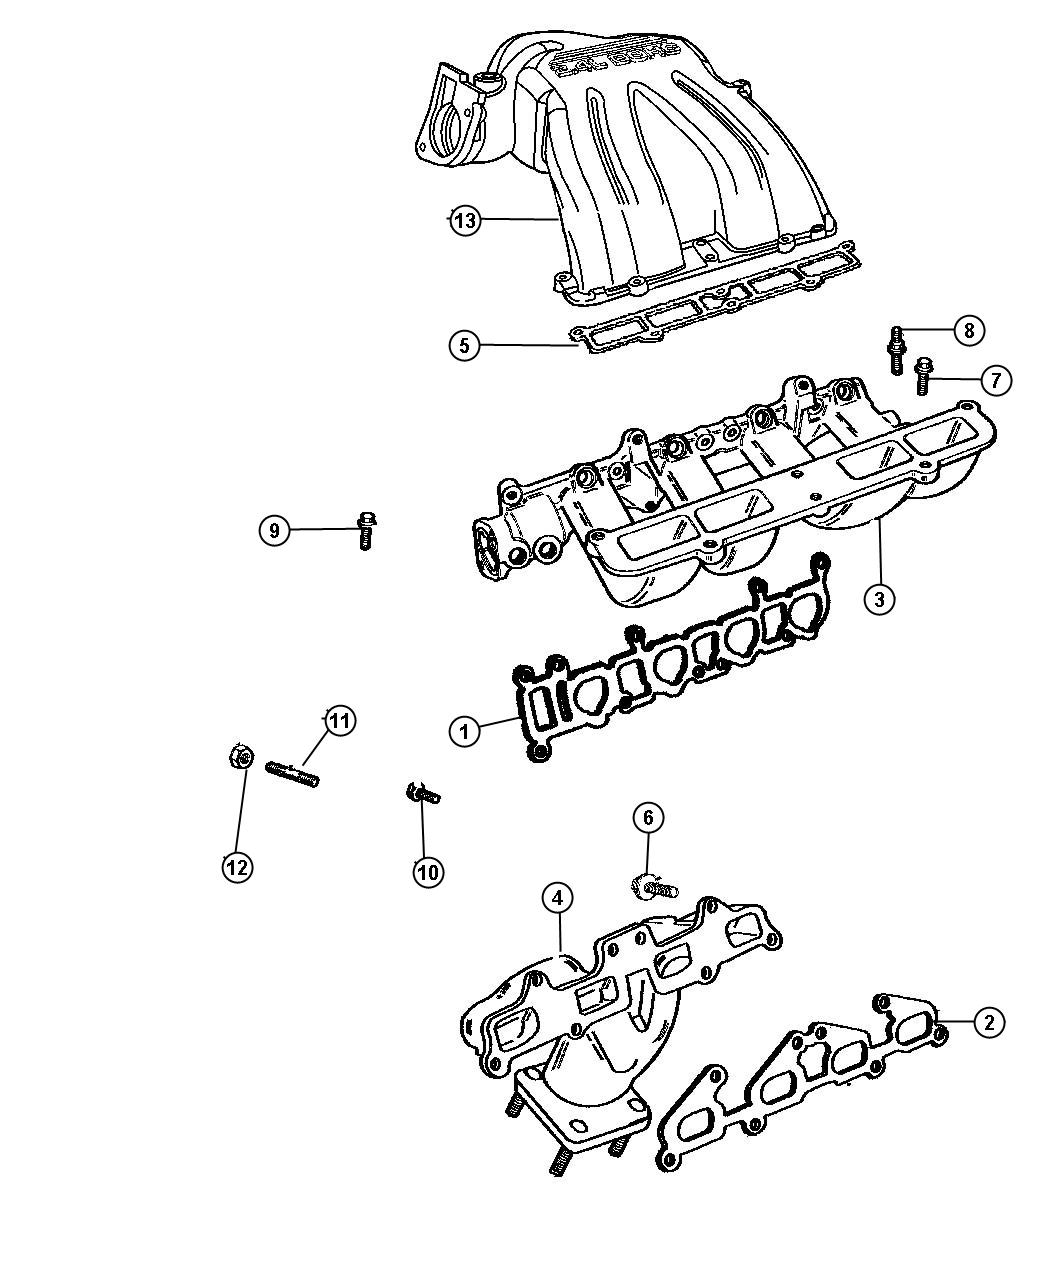 2005 Dodge Caravan Manifolds, Intake and Exhaust 2.4L